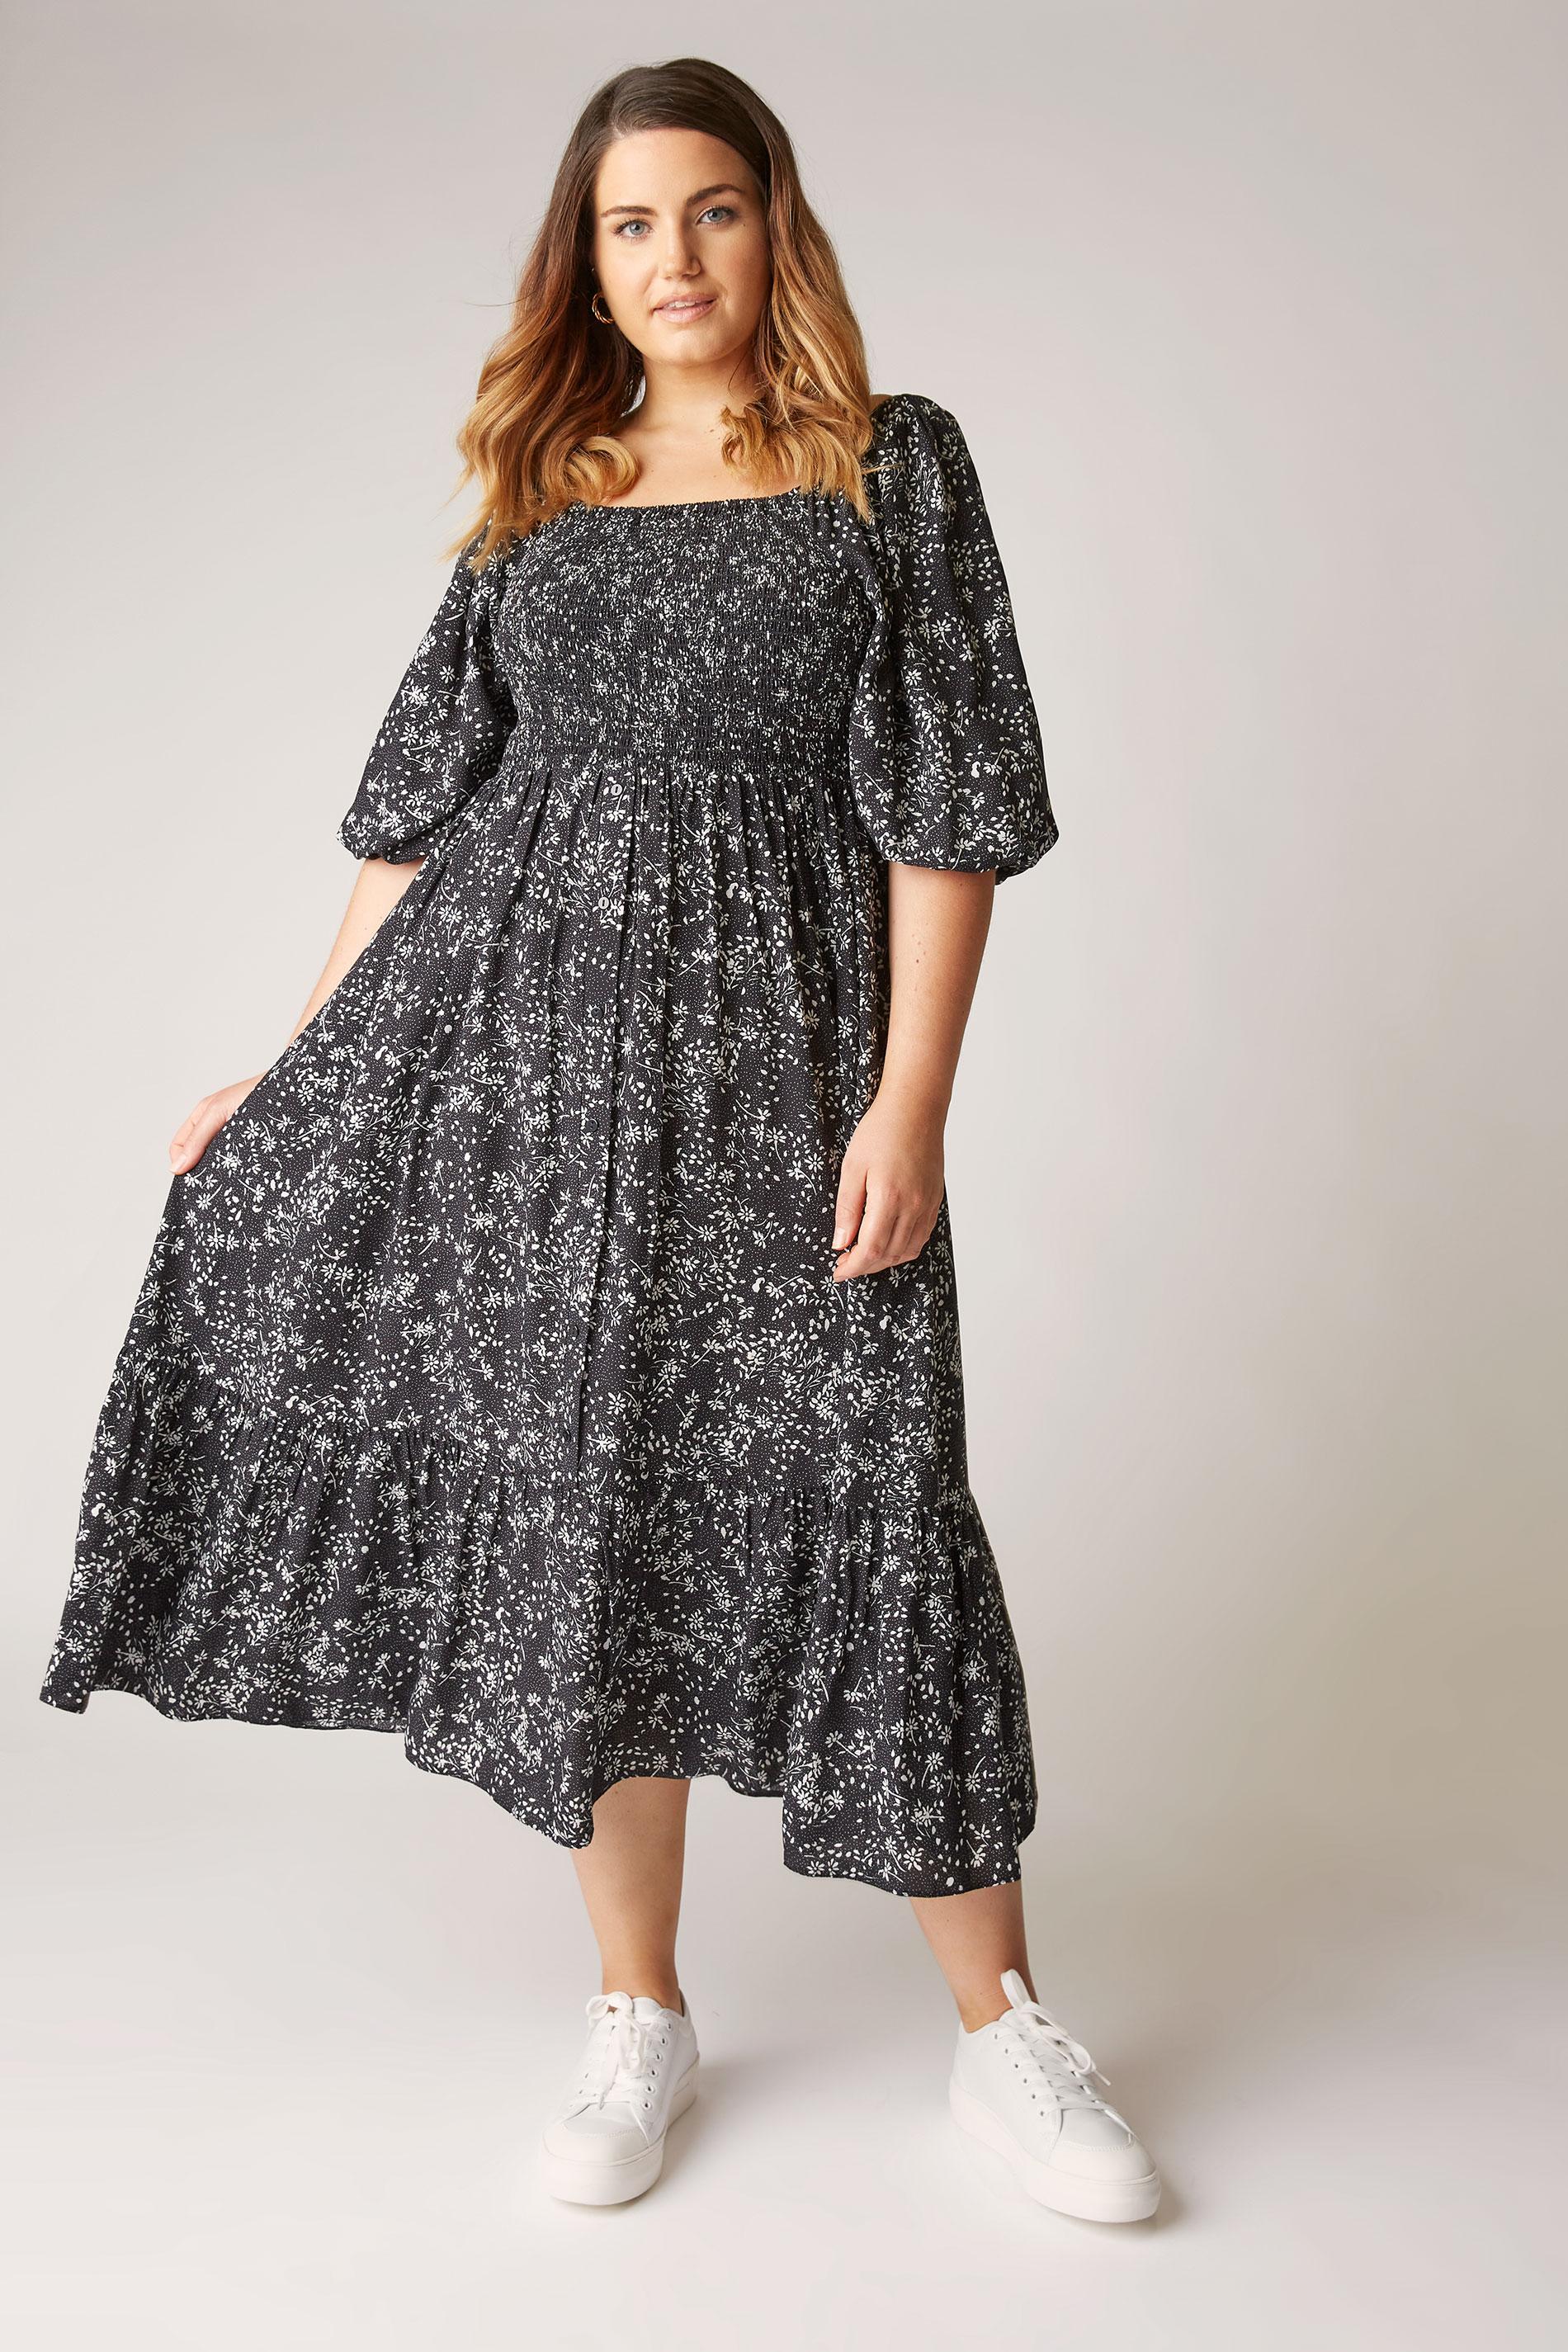 THE LIMITED EDIT Black Ditsy Print Shirred Midaxi Dress